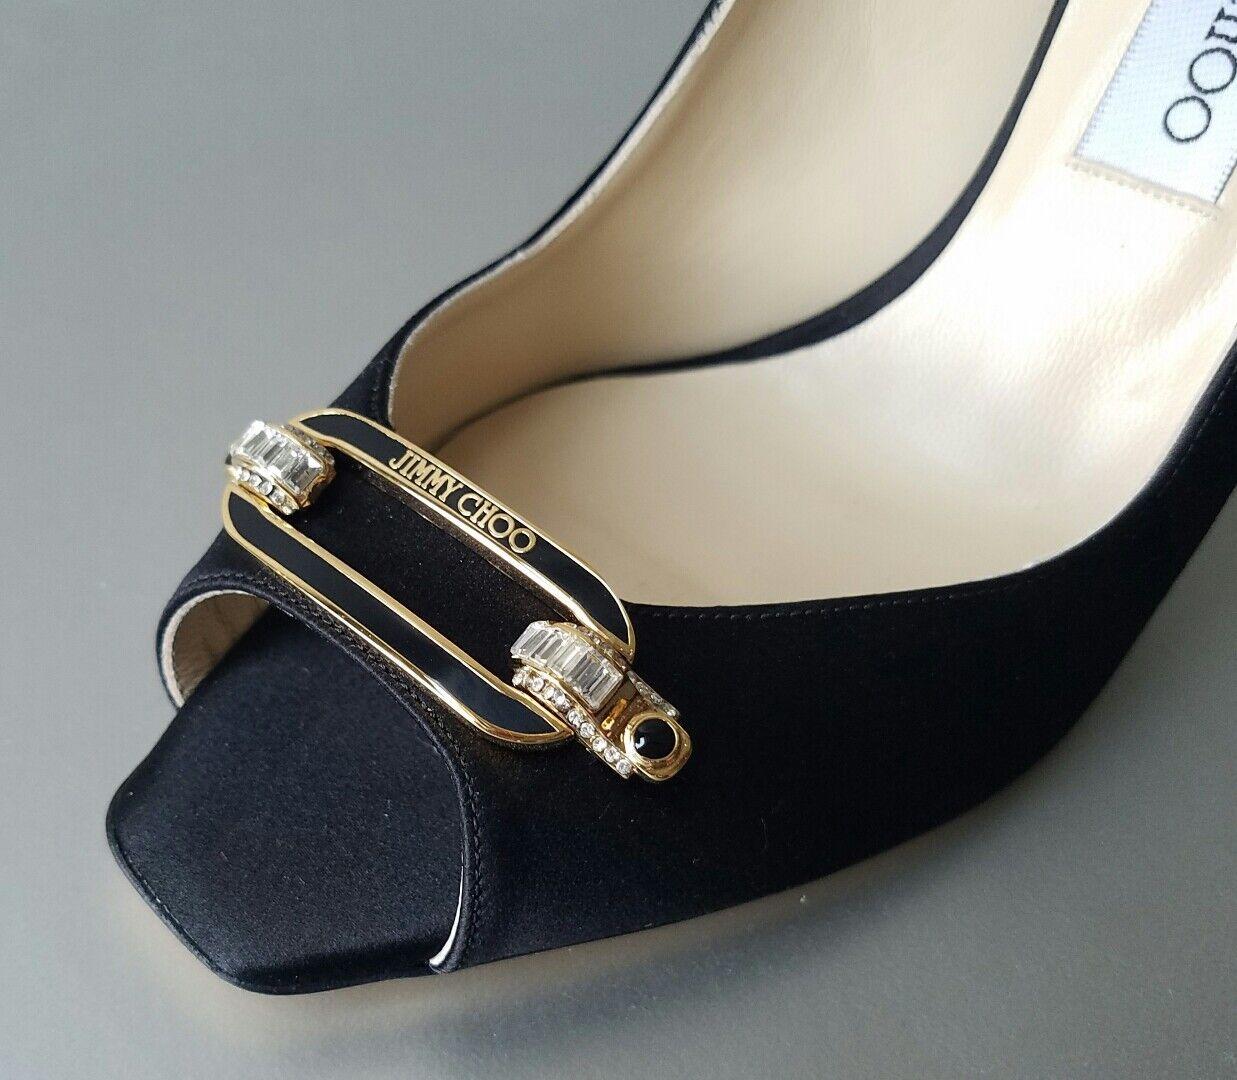 JIMMY CHOO LEE Black Satin Logo Crystal Slingback Shoes EU 41 I LOVE SHOES